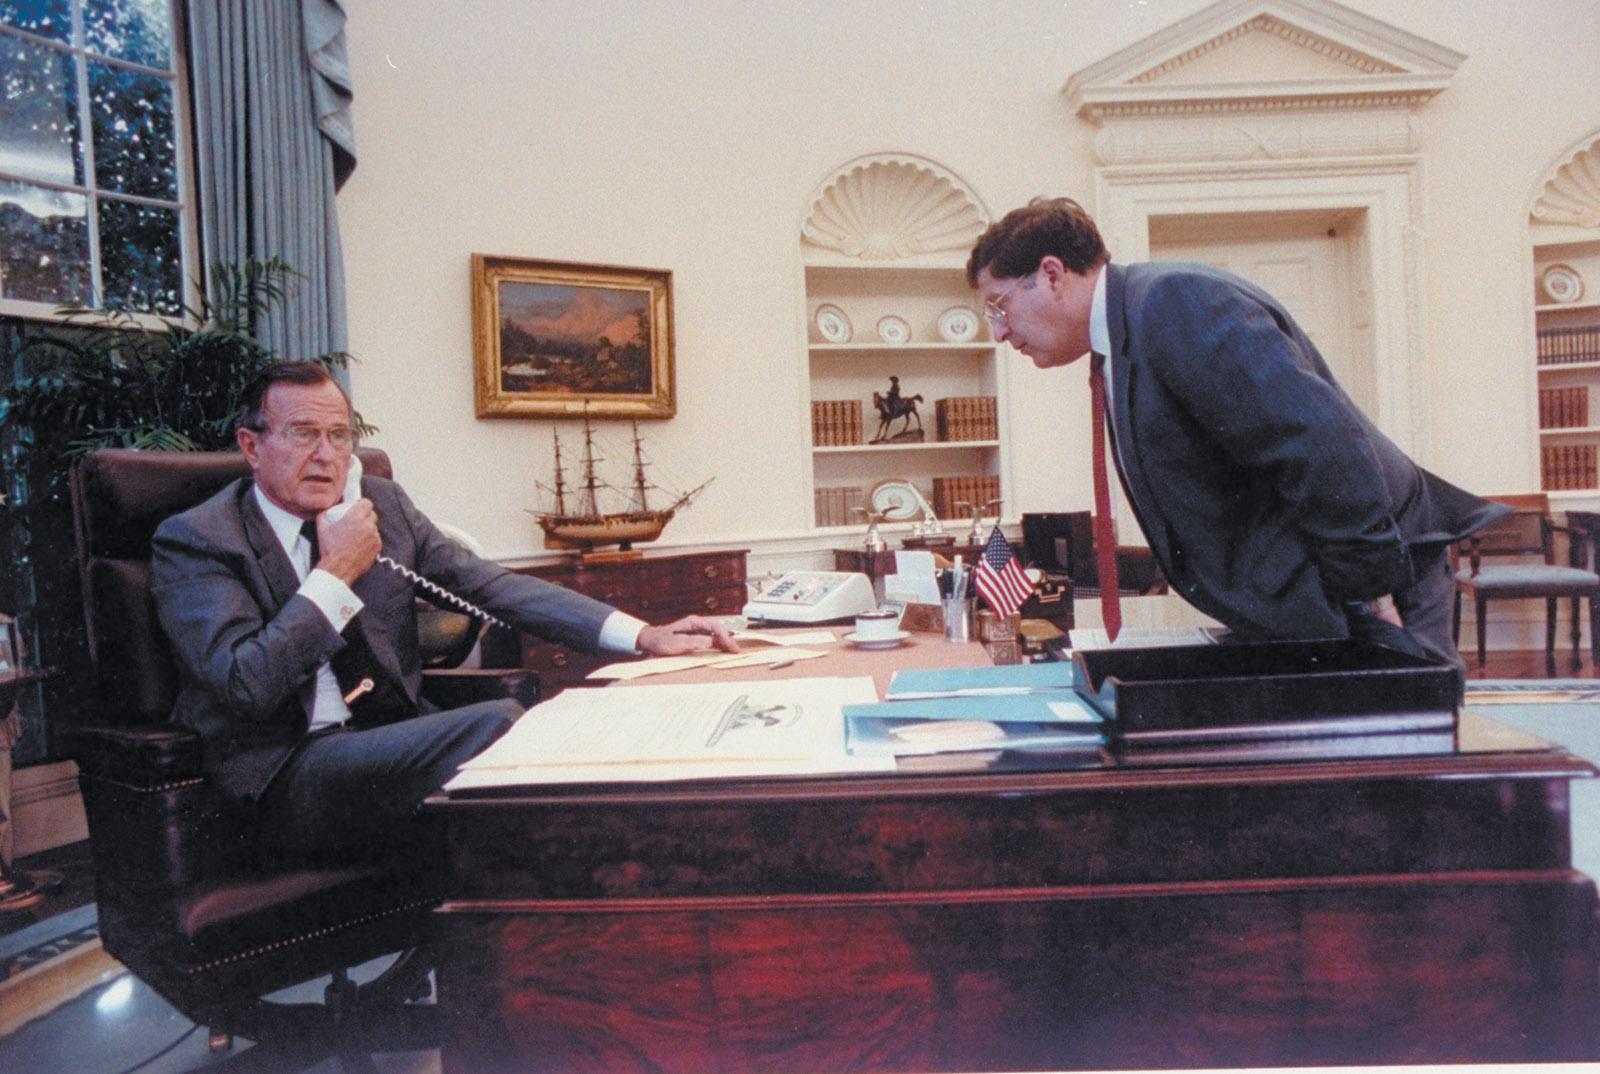 President George H.W. Bush and John Sununu, at the White House, 1990